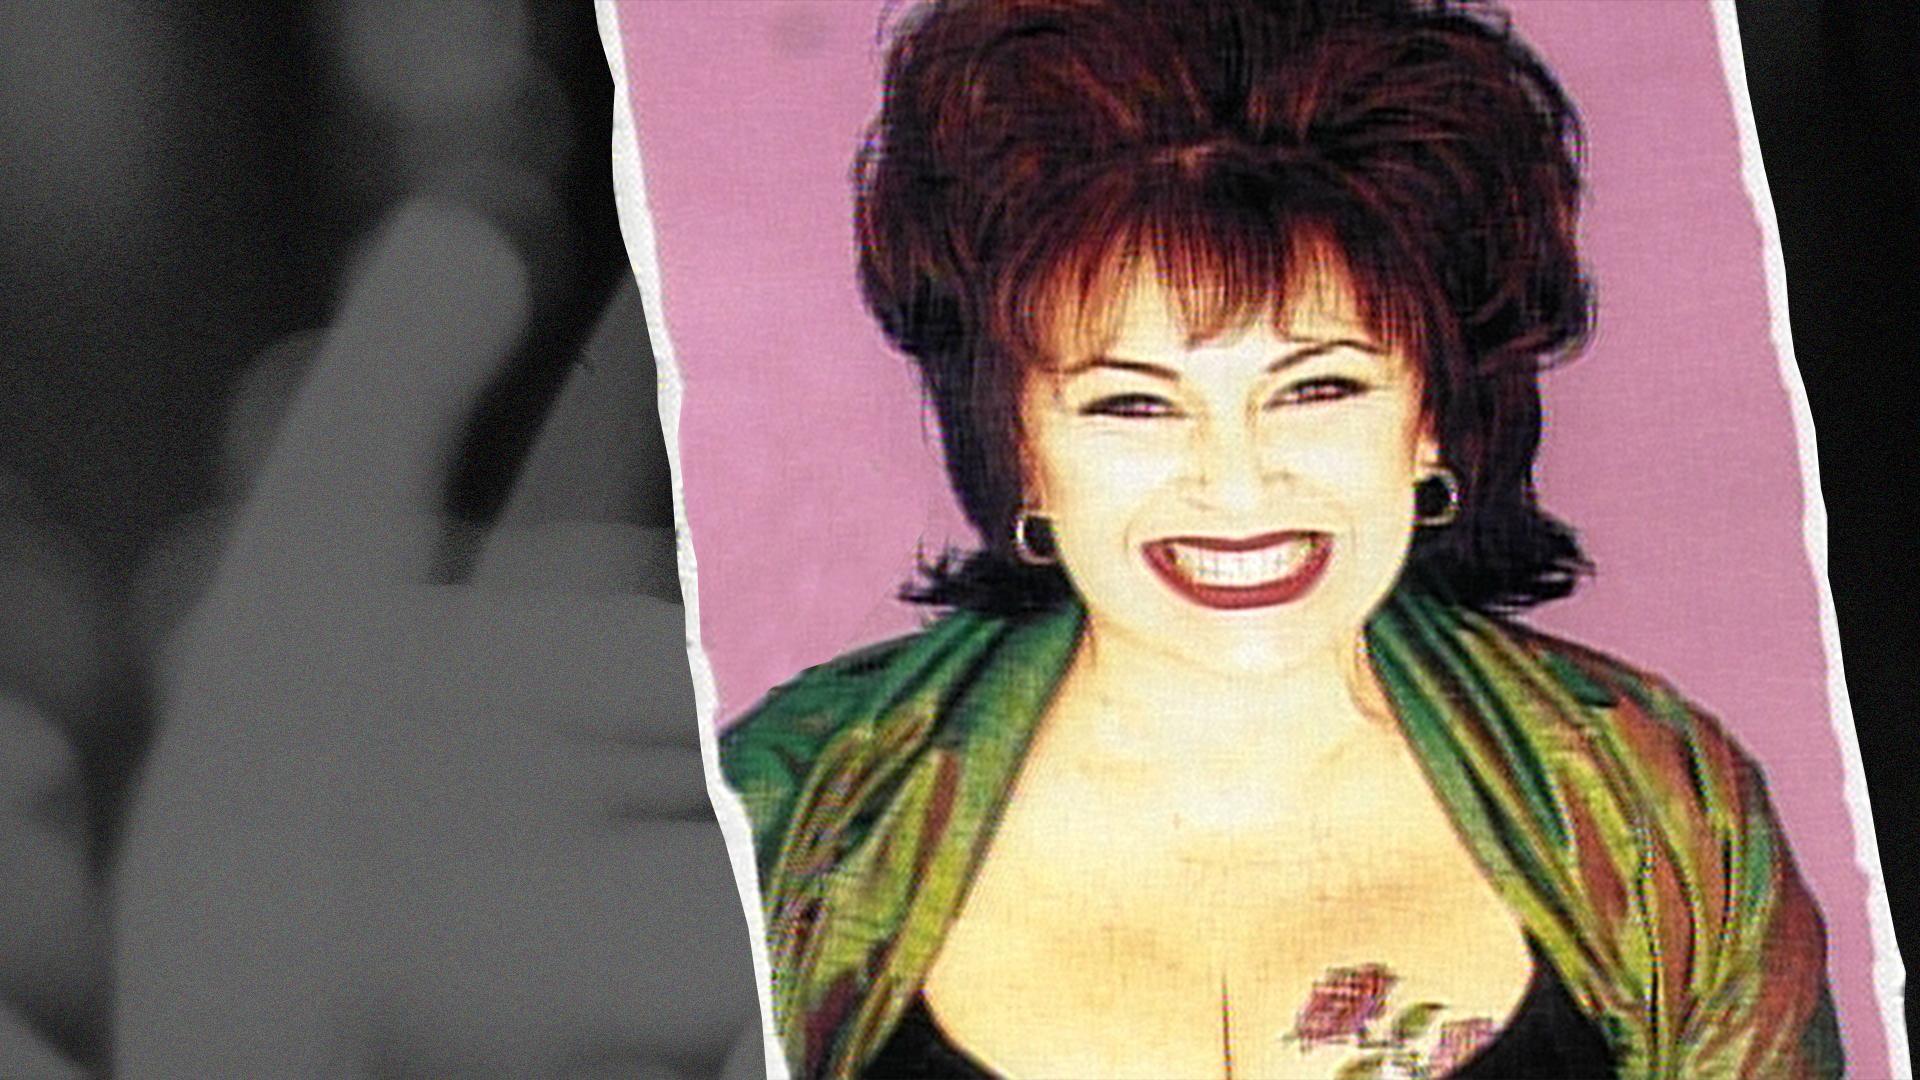 Roseanne: December 3, 1994